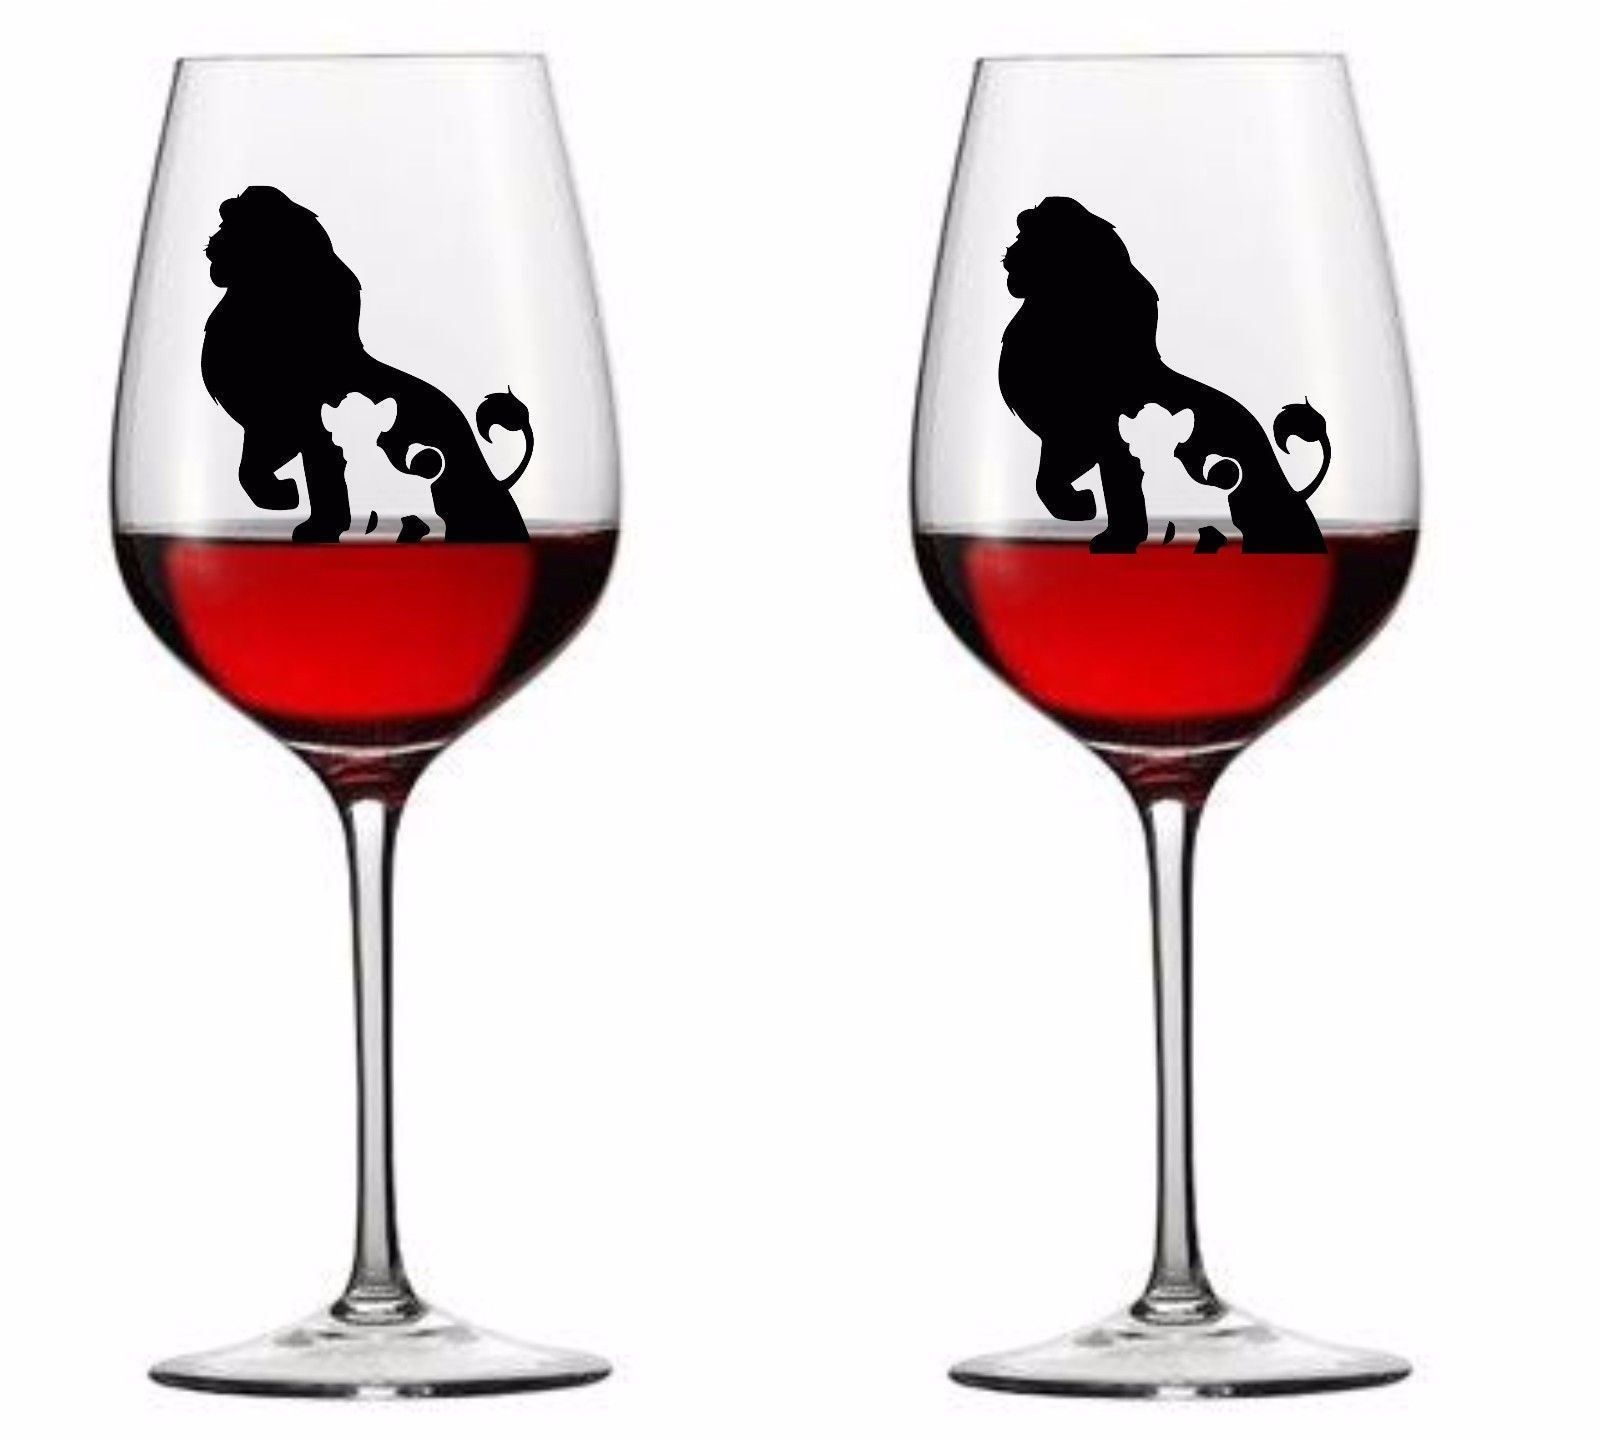 2 99 Gbp 9 X Lion King Vinyl Decal Wine Glass Stickers Mug Ebay Home Garden Wine Glass Glass Lion King